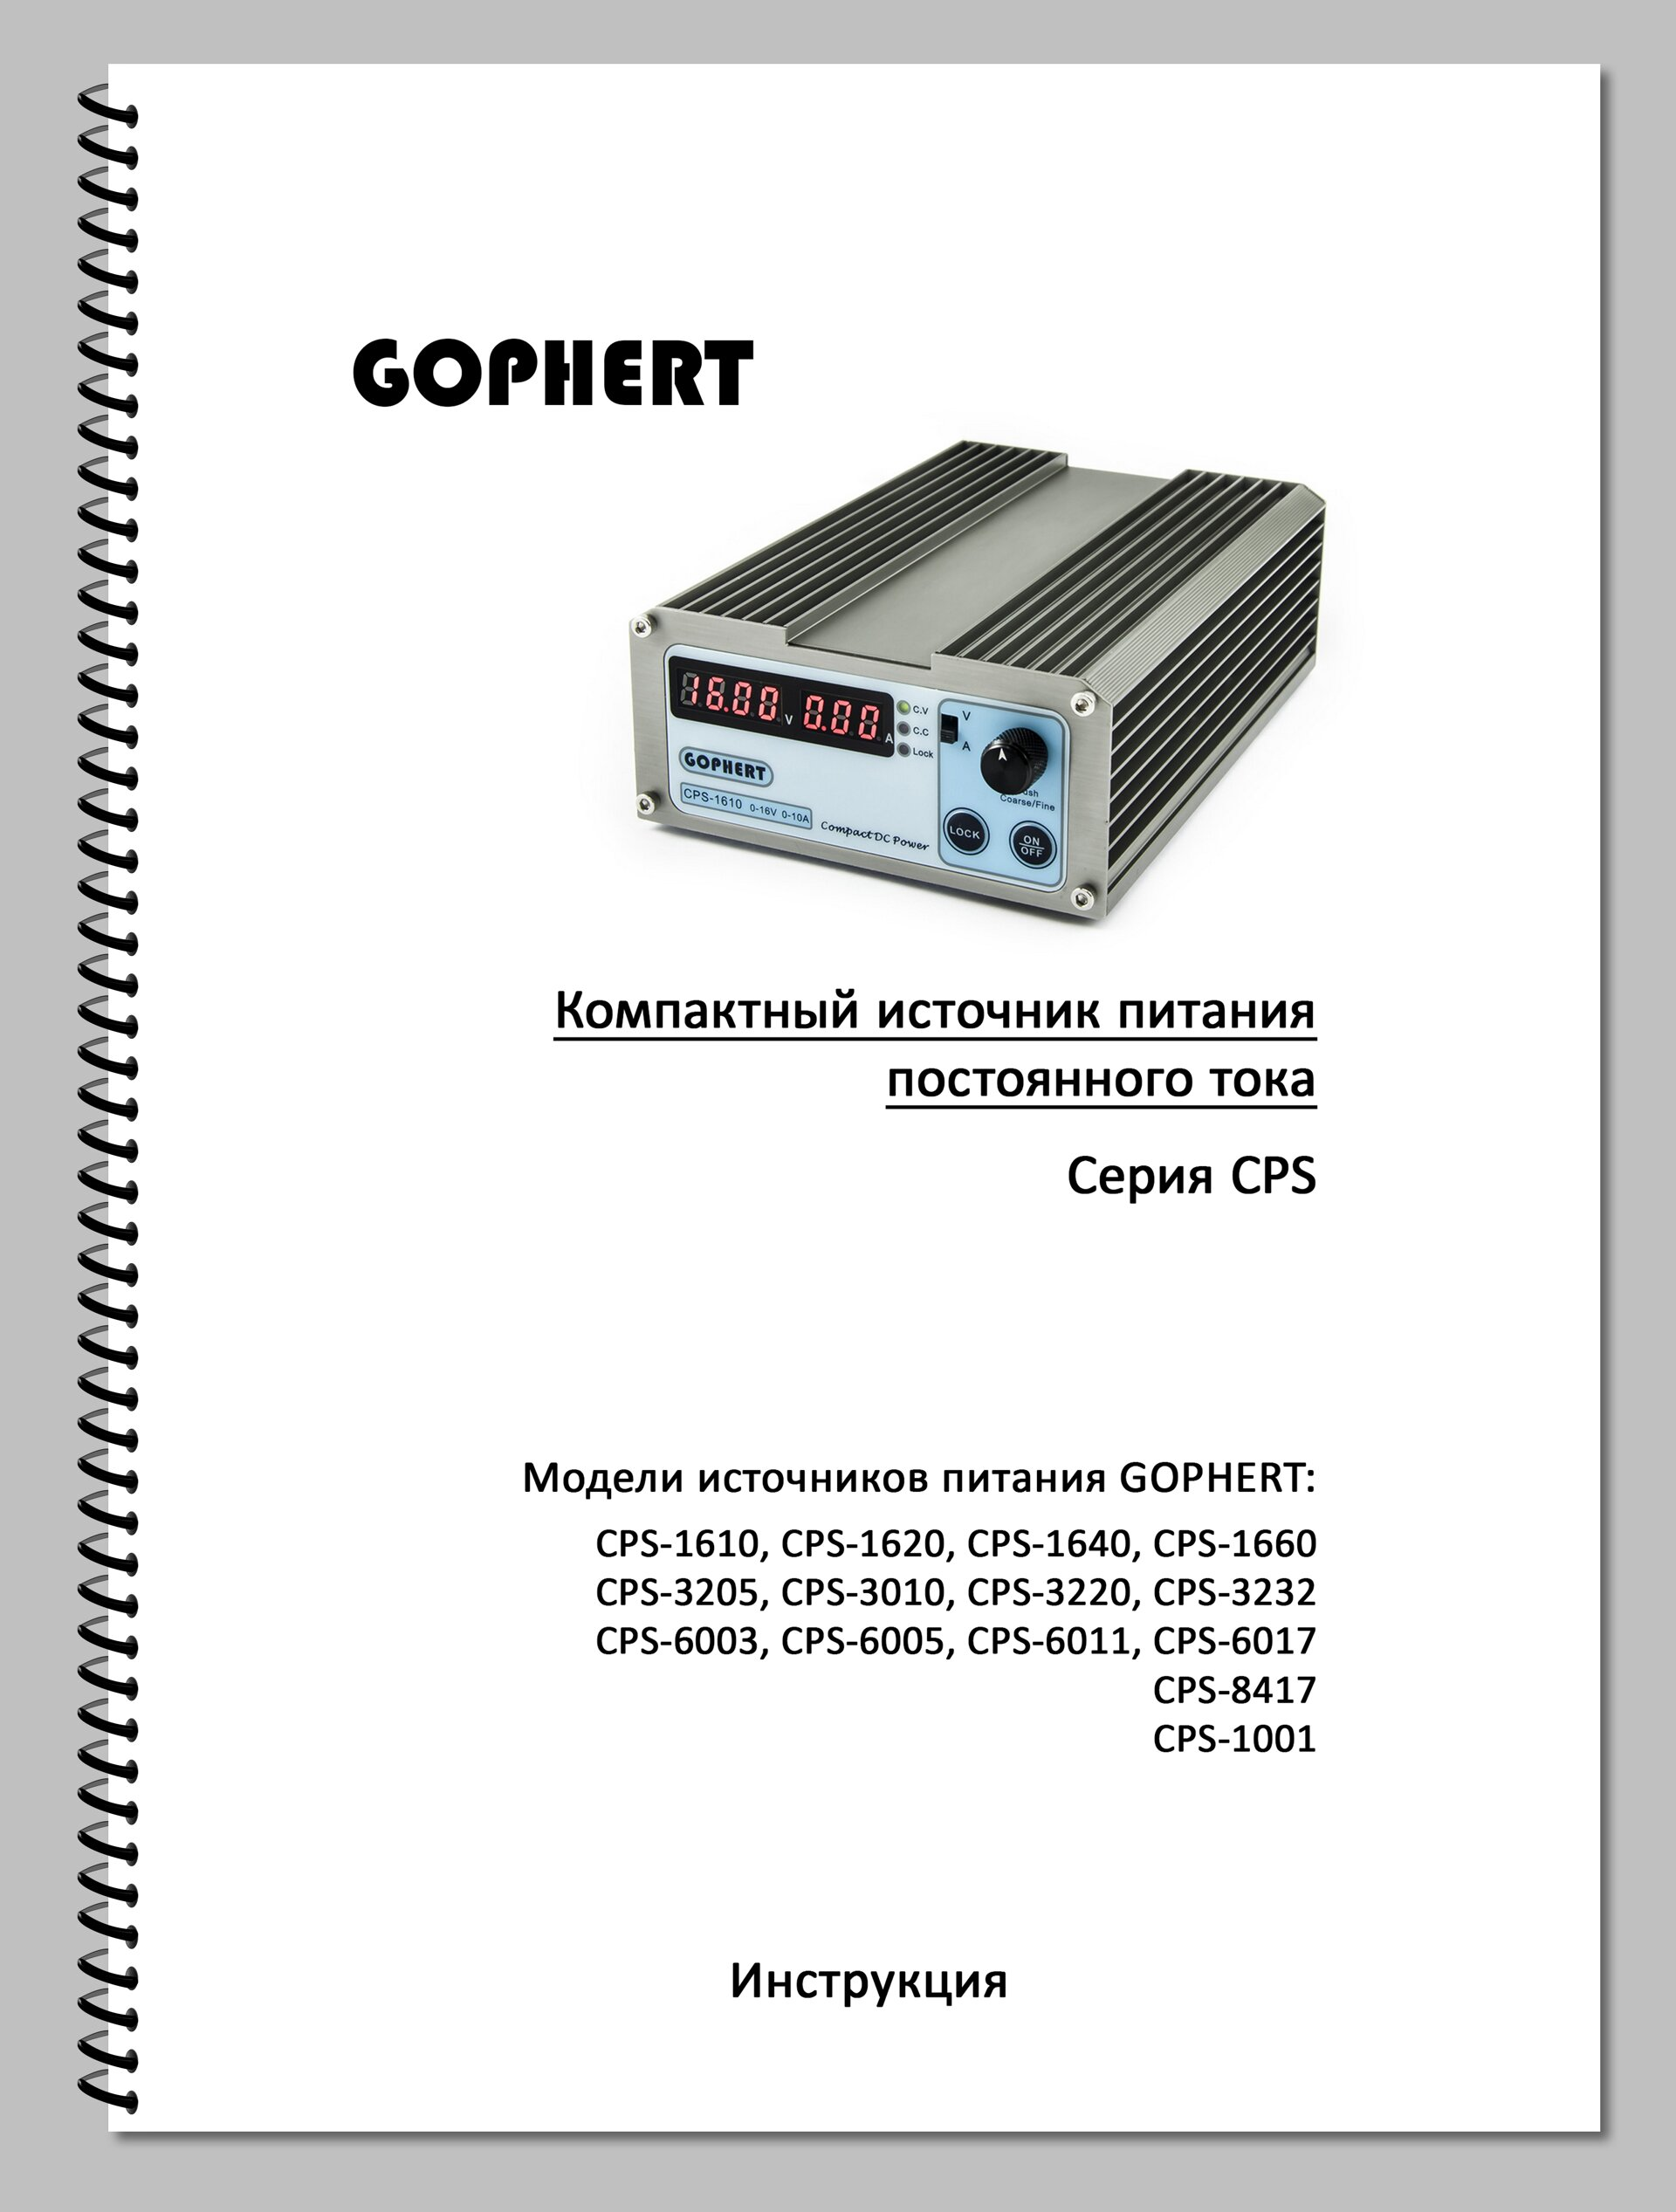 Gophert руководство, инструкция, паспорт